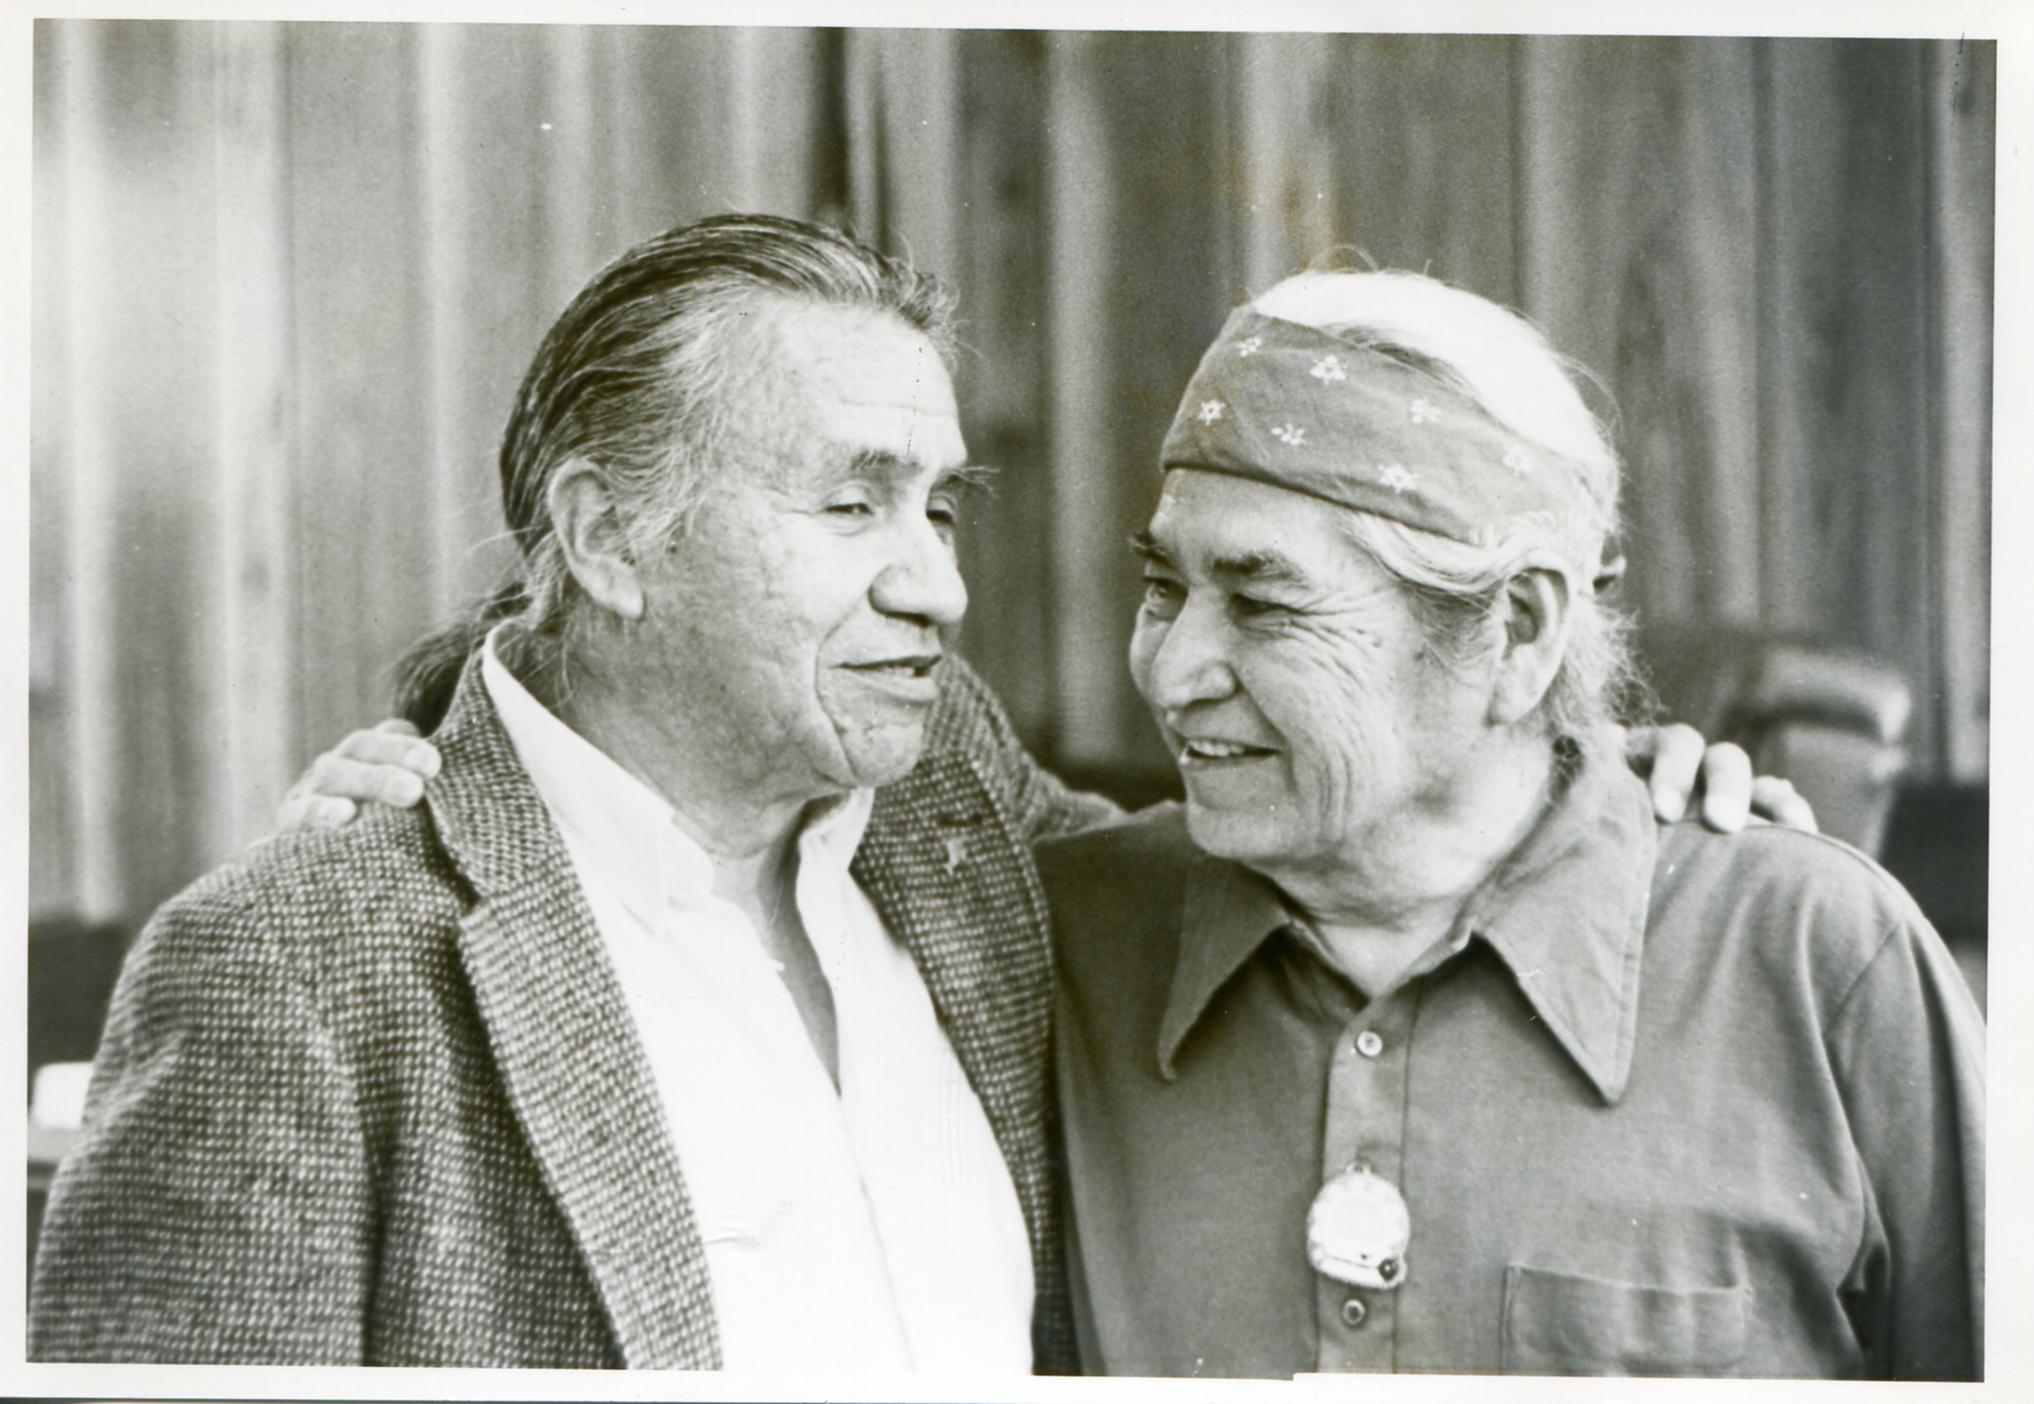 Billy Frank Jr and David Sohappy in Yakama Tribal Court